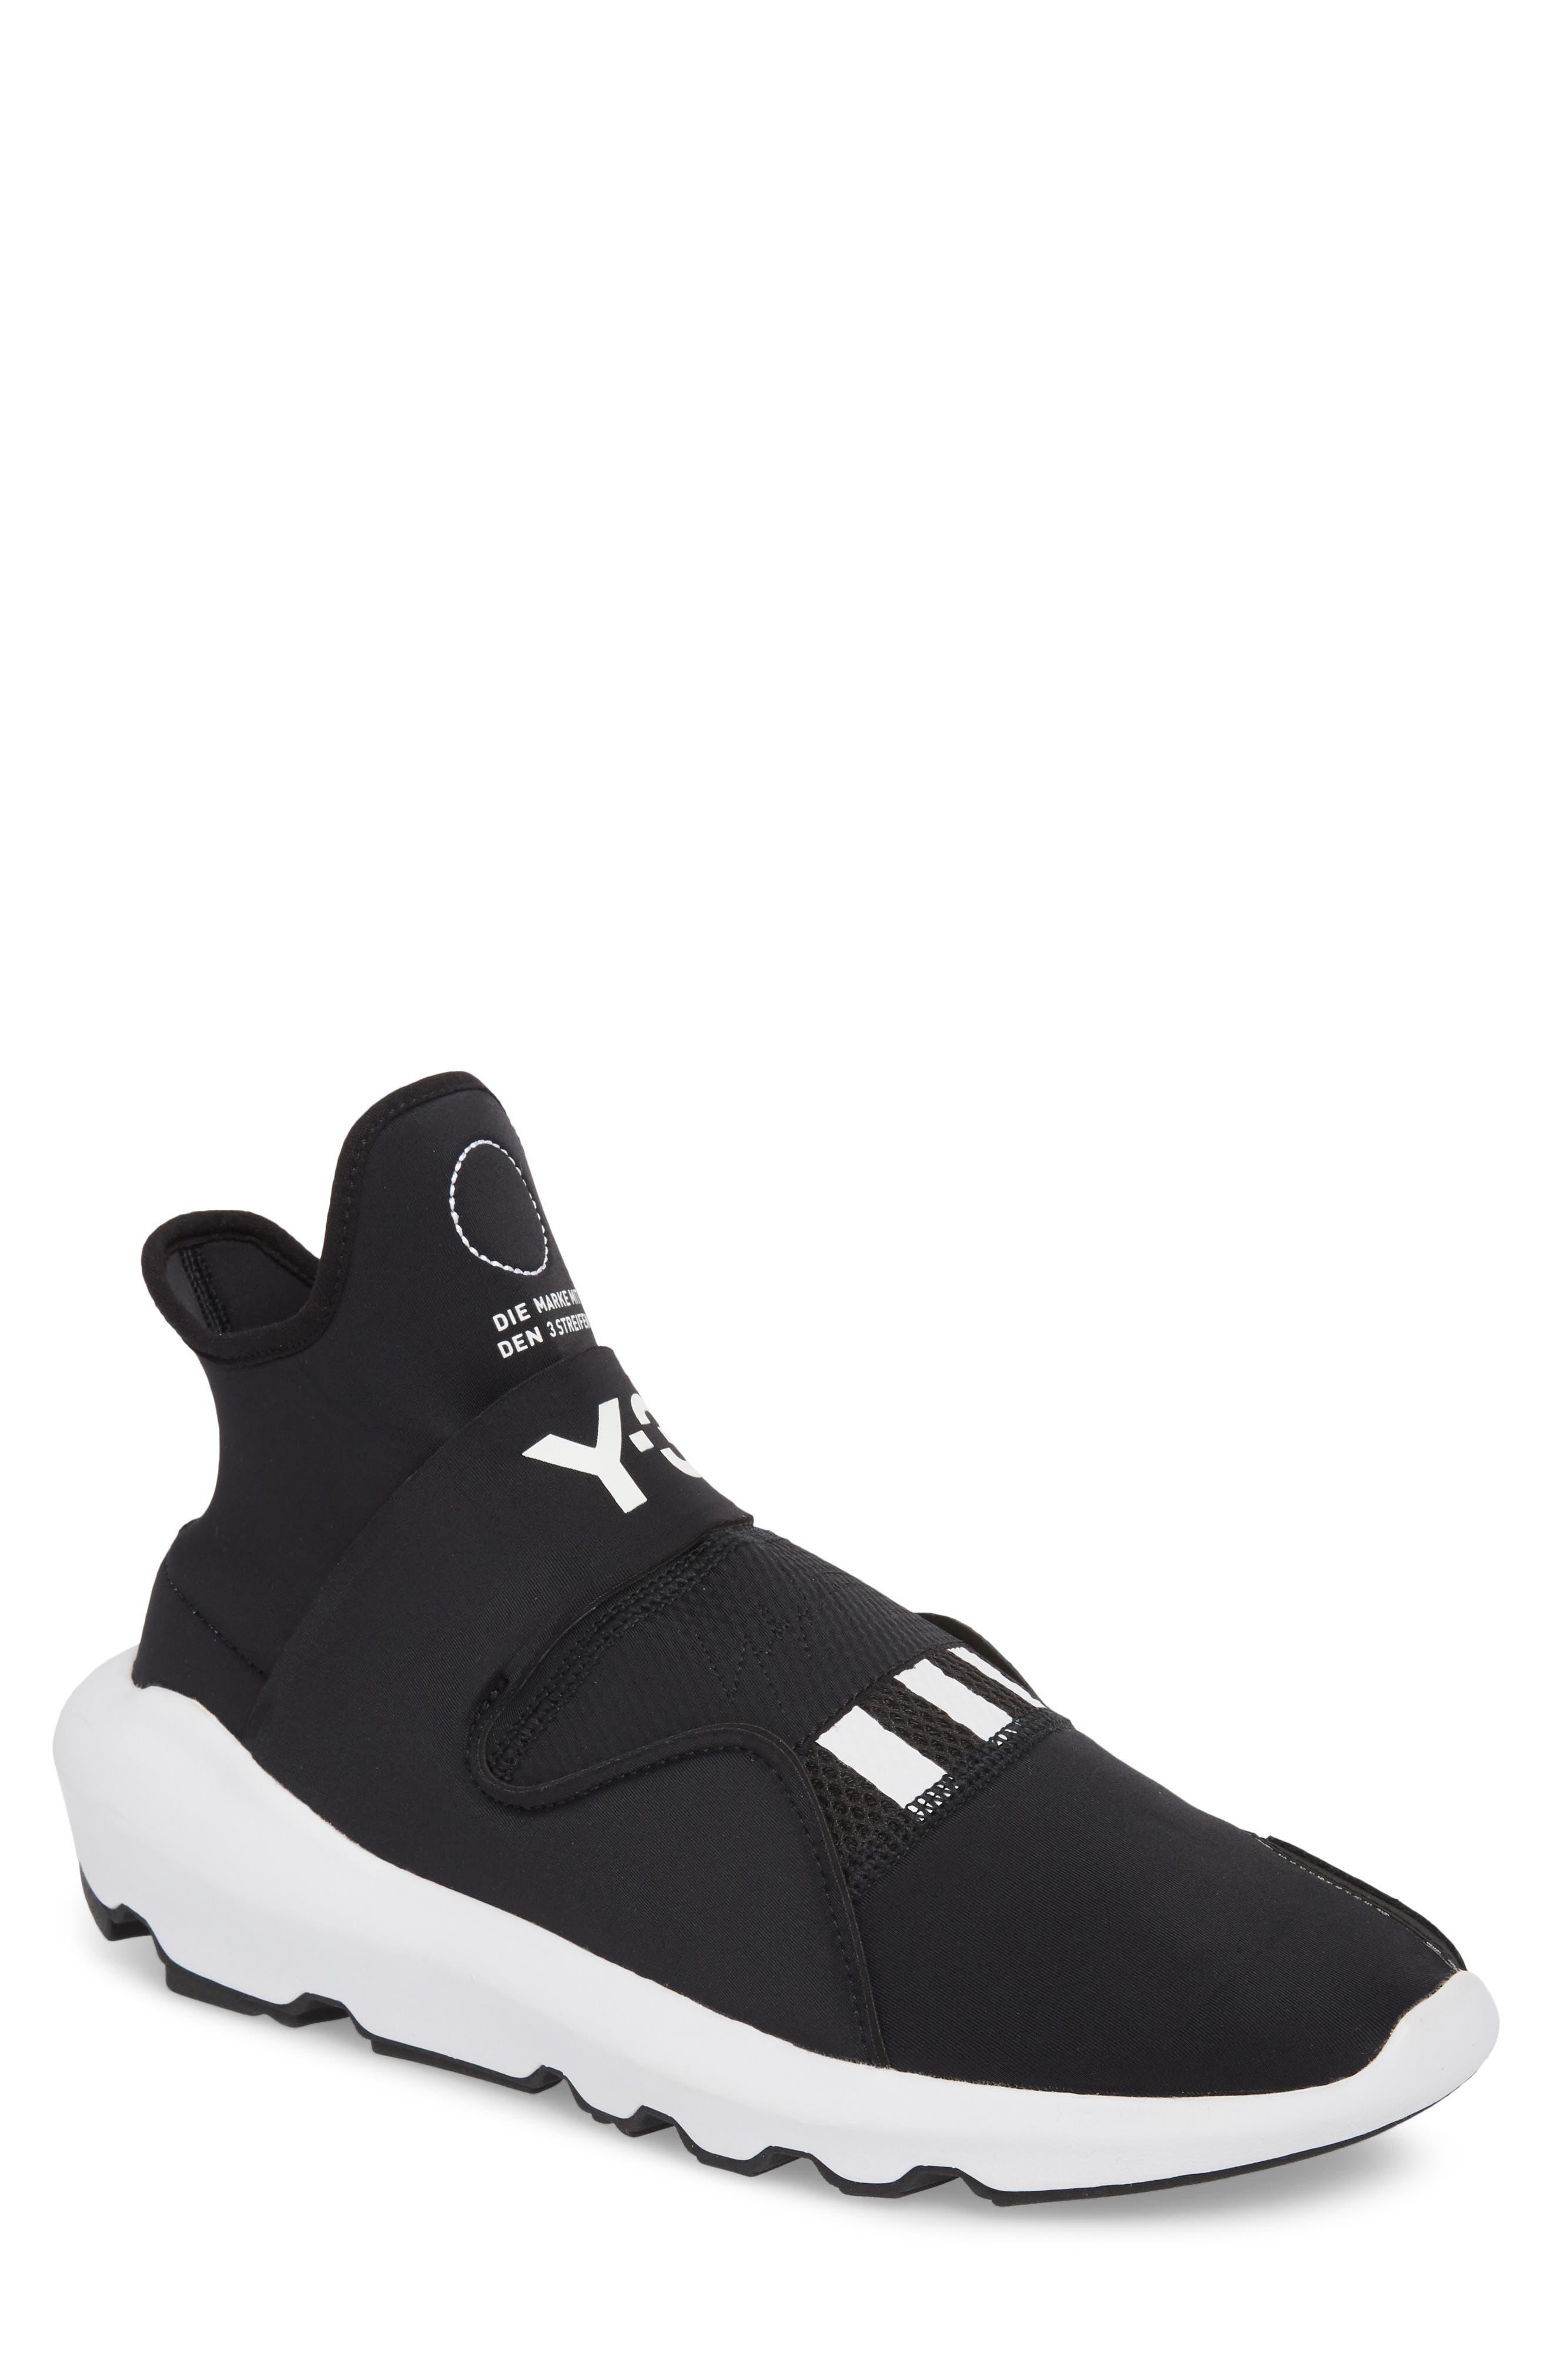 x adidas Suberou Sneaker,                             Main thumbnail 1, color,                             010